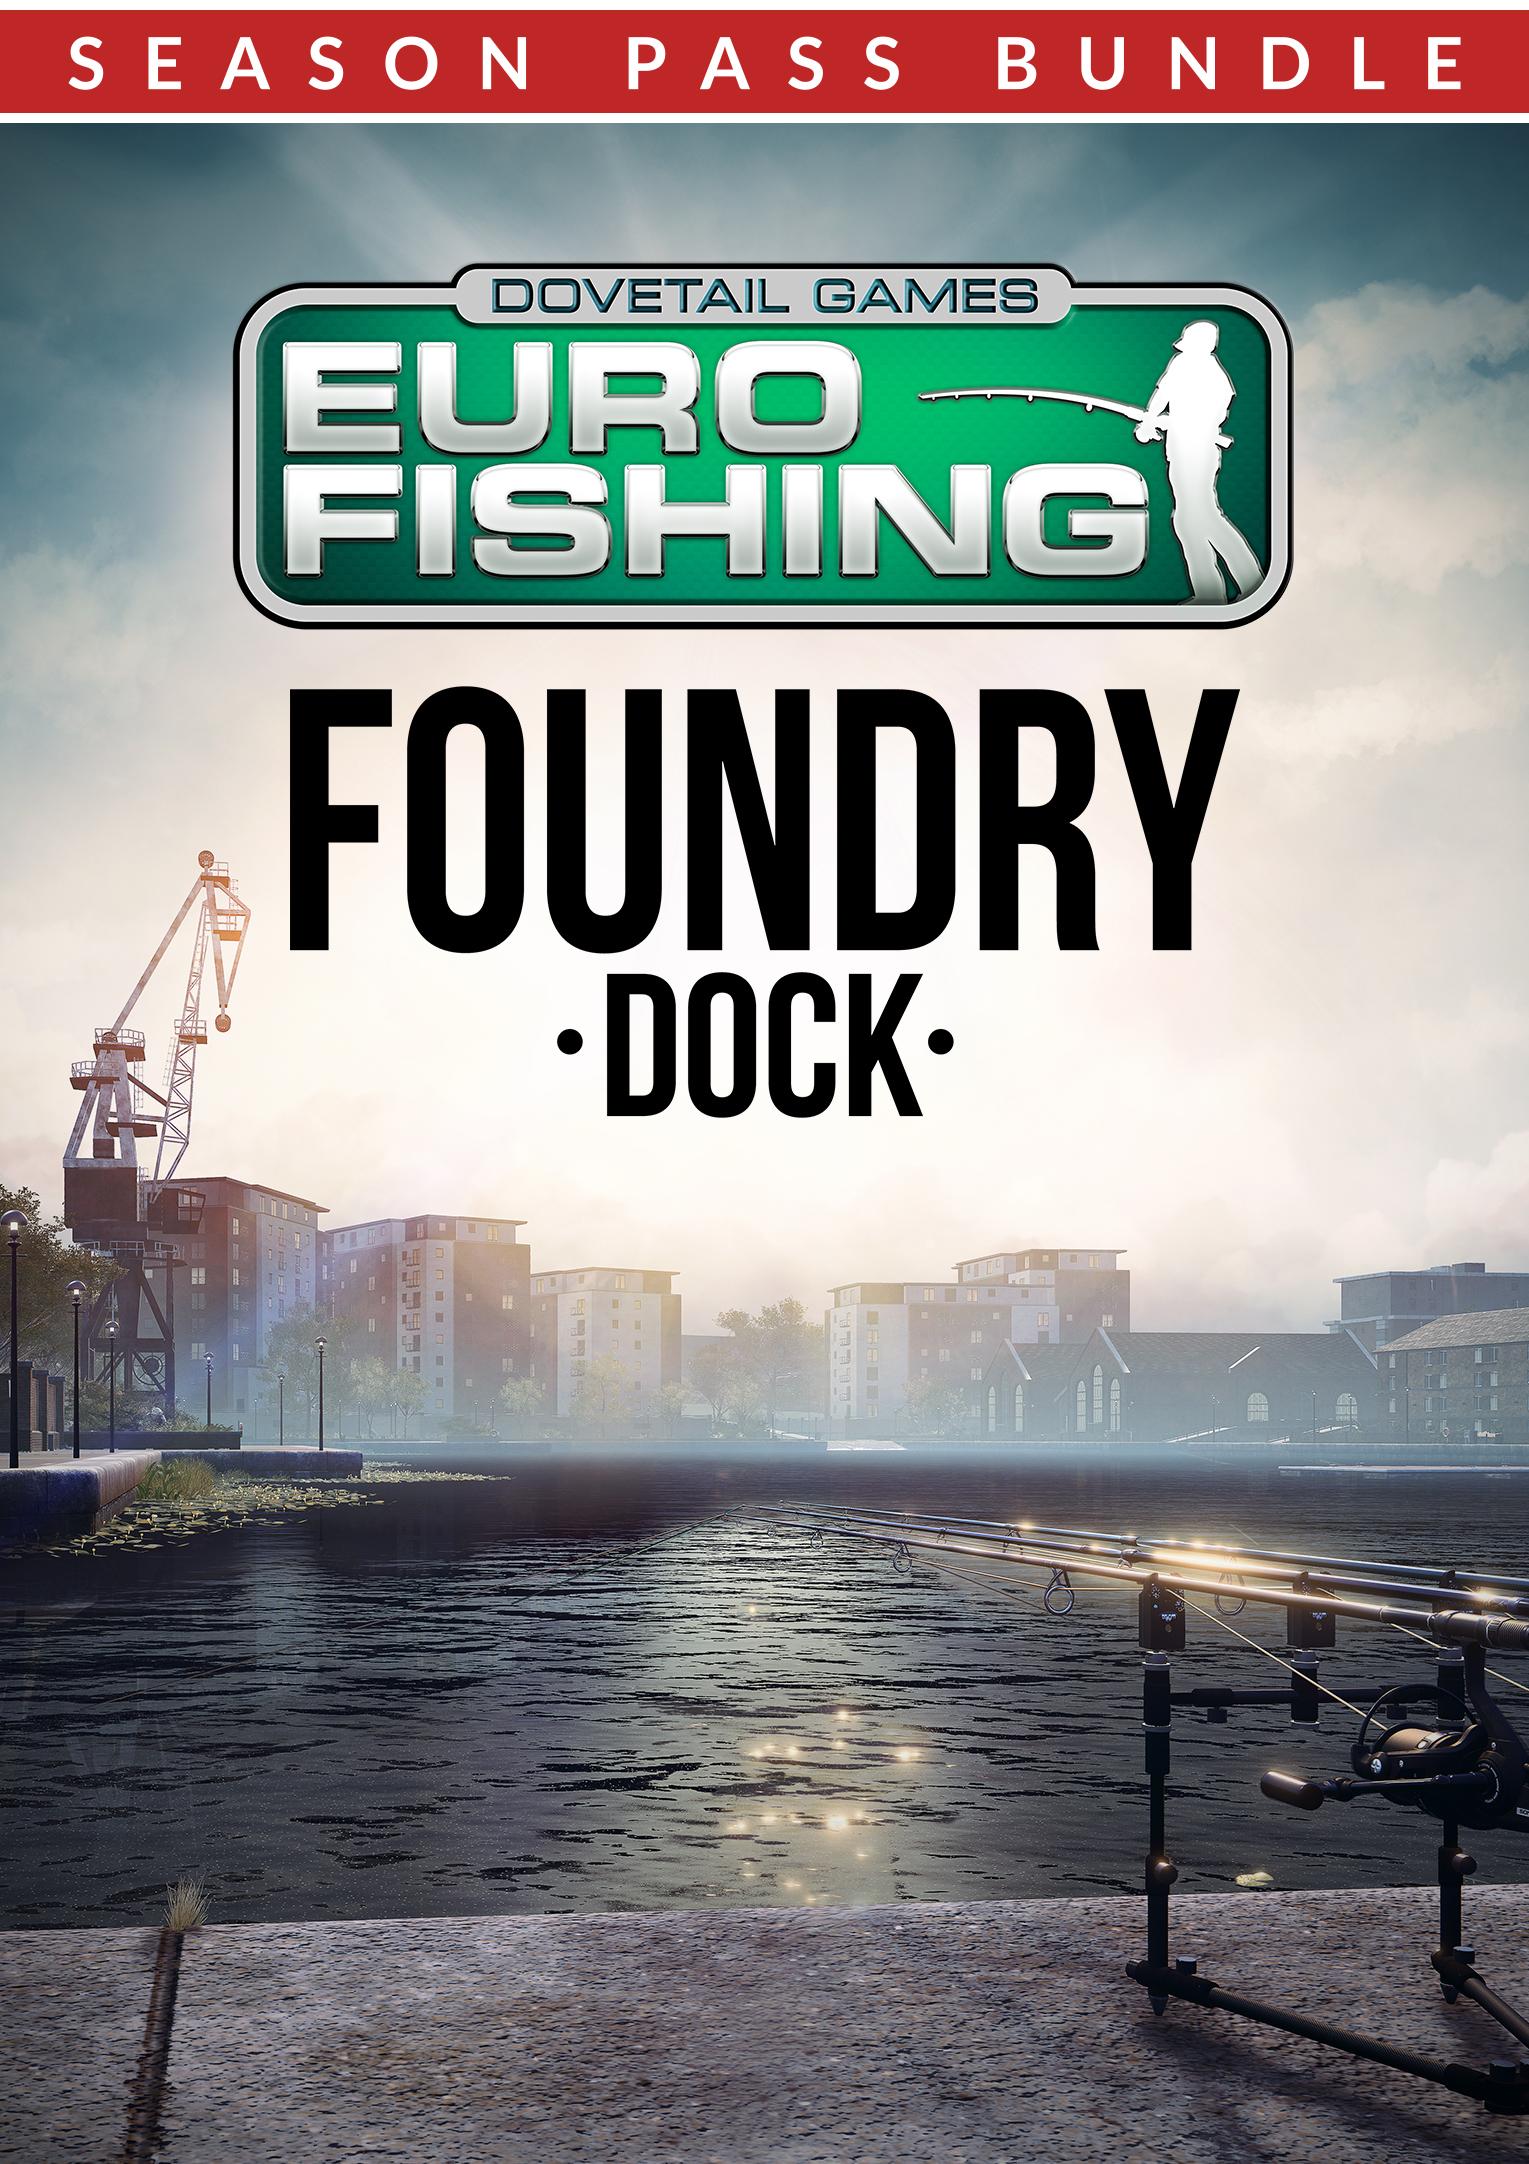 Euro Fishing Foundry Dock + Season Pass [PC Code - Steam]